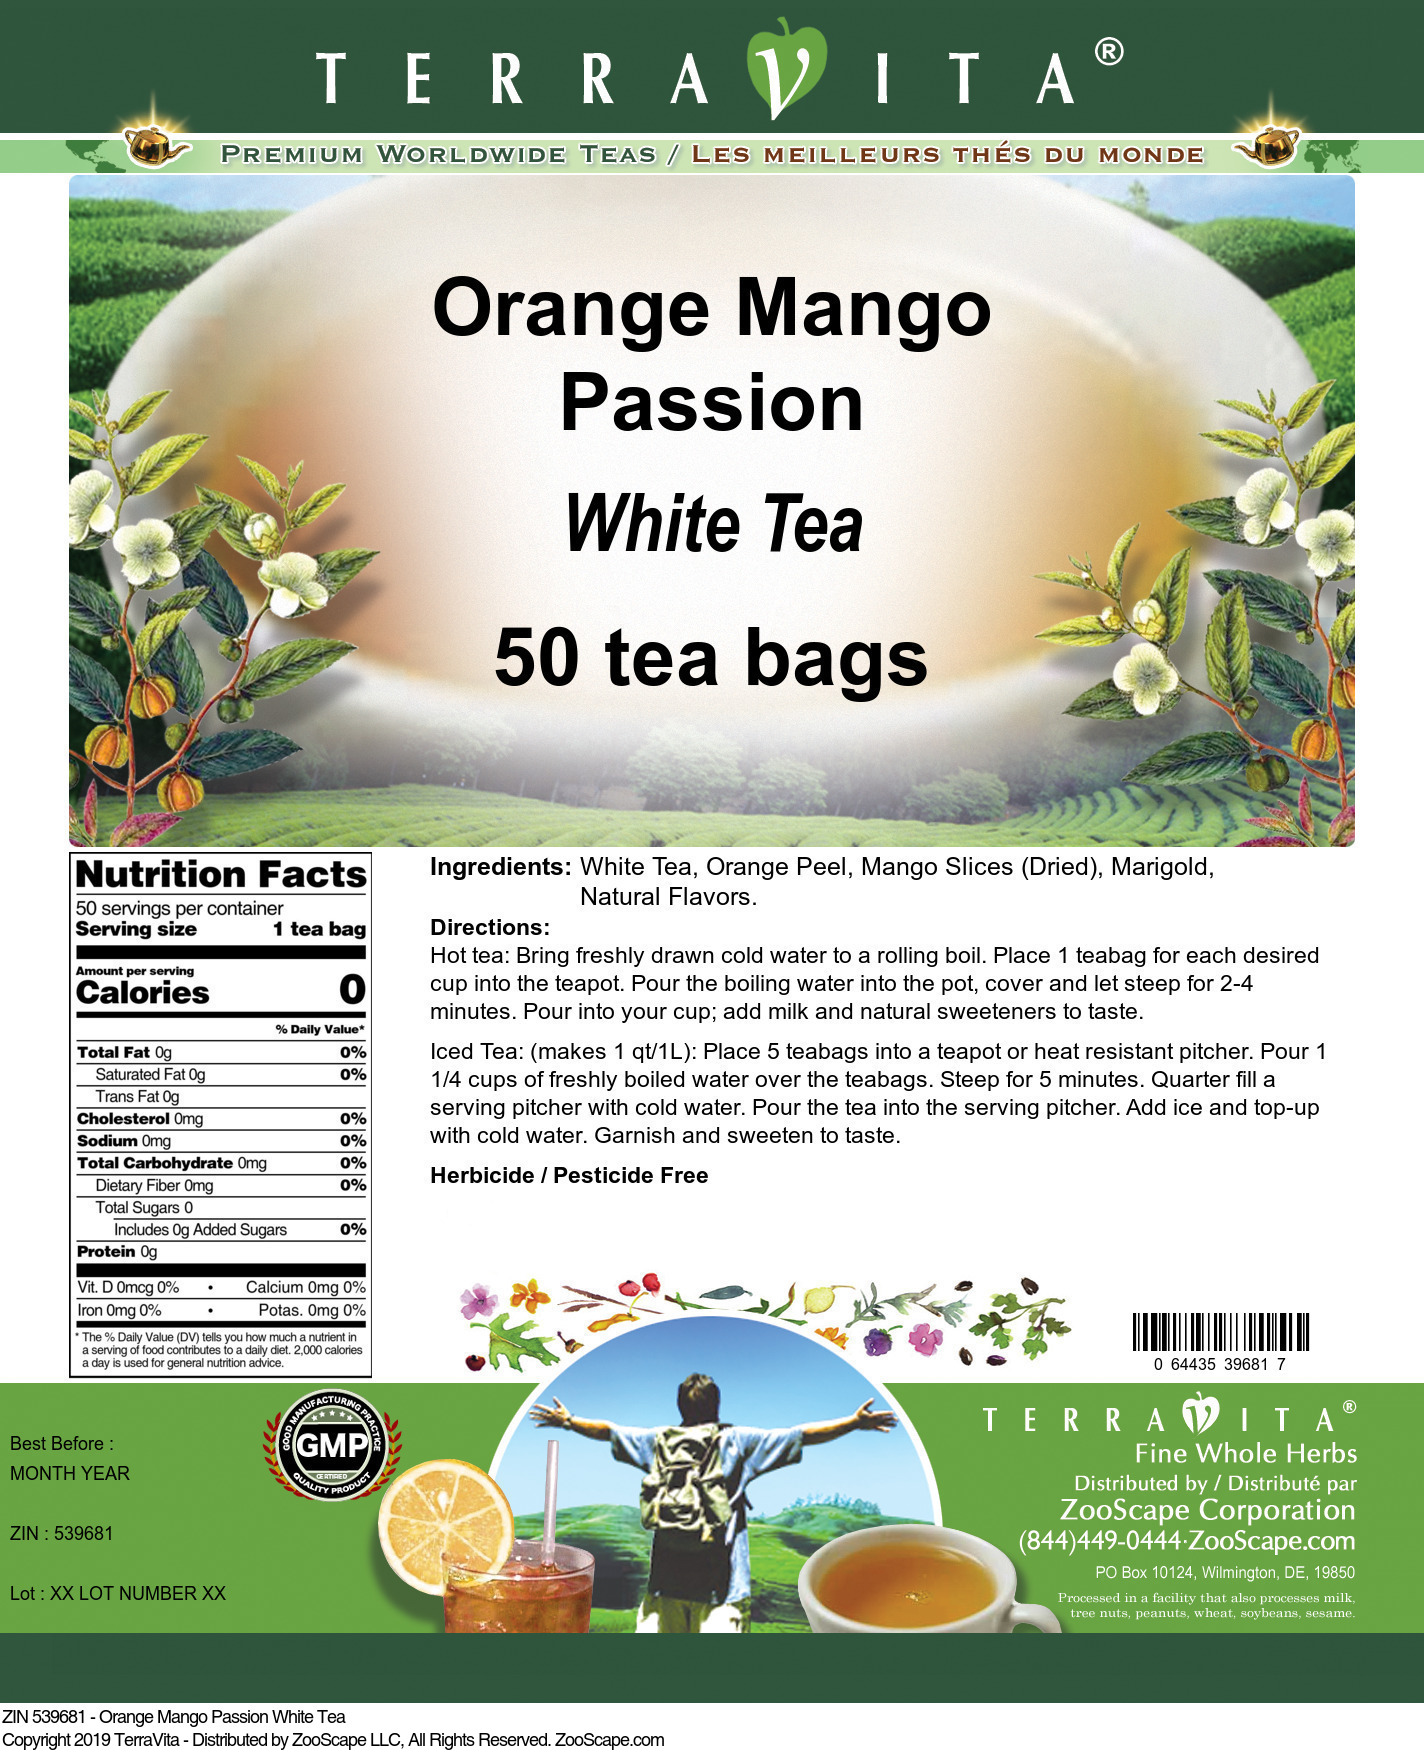 Orange Mango Passion White Tea